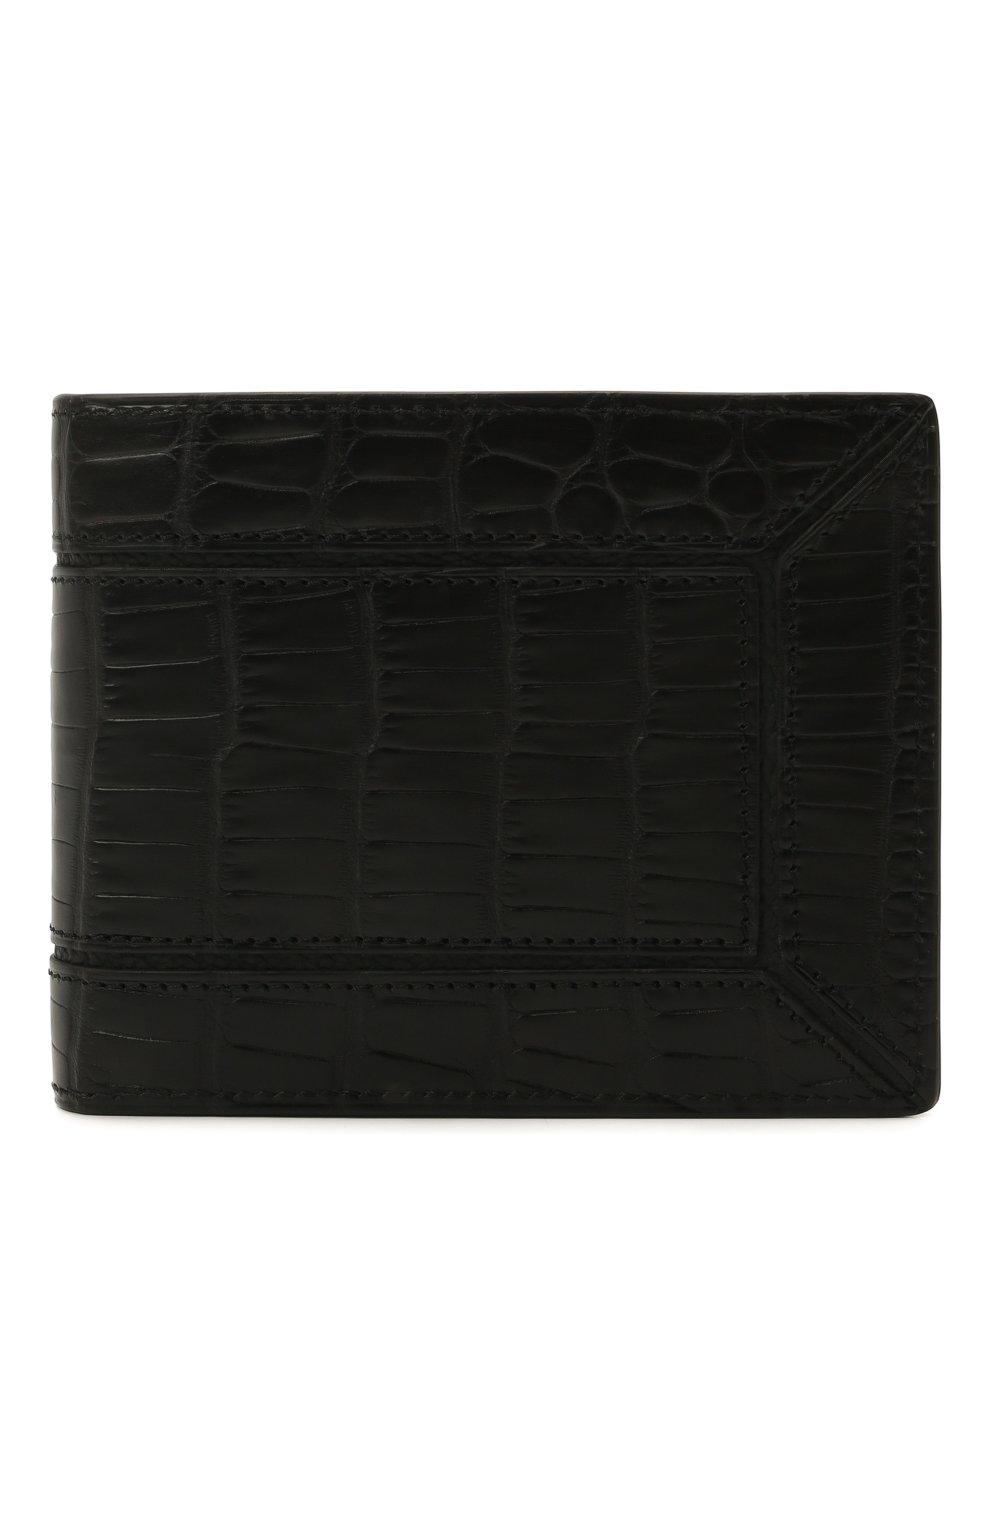 Мужской портмоне из кожи аллигатора ZILLI черного цвета, арт. MJL-0WB02-A0106/0002/AMIS   Фото 1 (Материал: Экзотическая кожа)